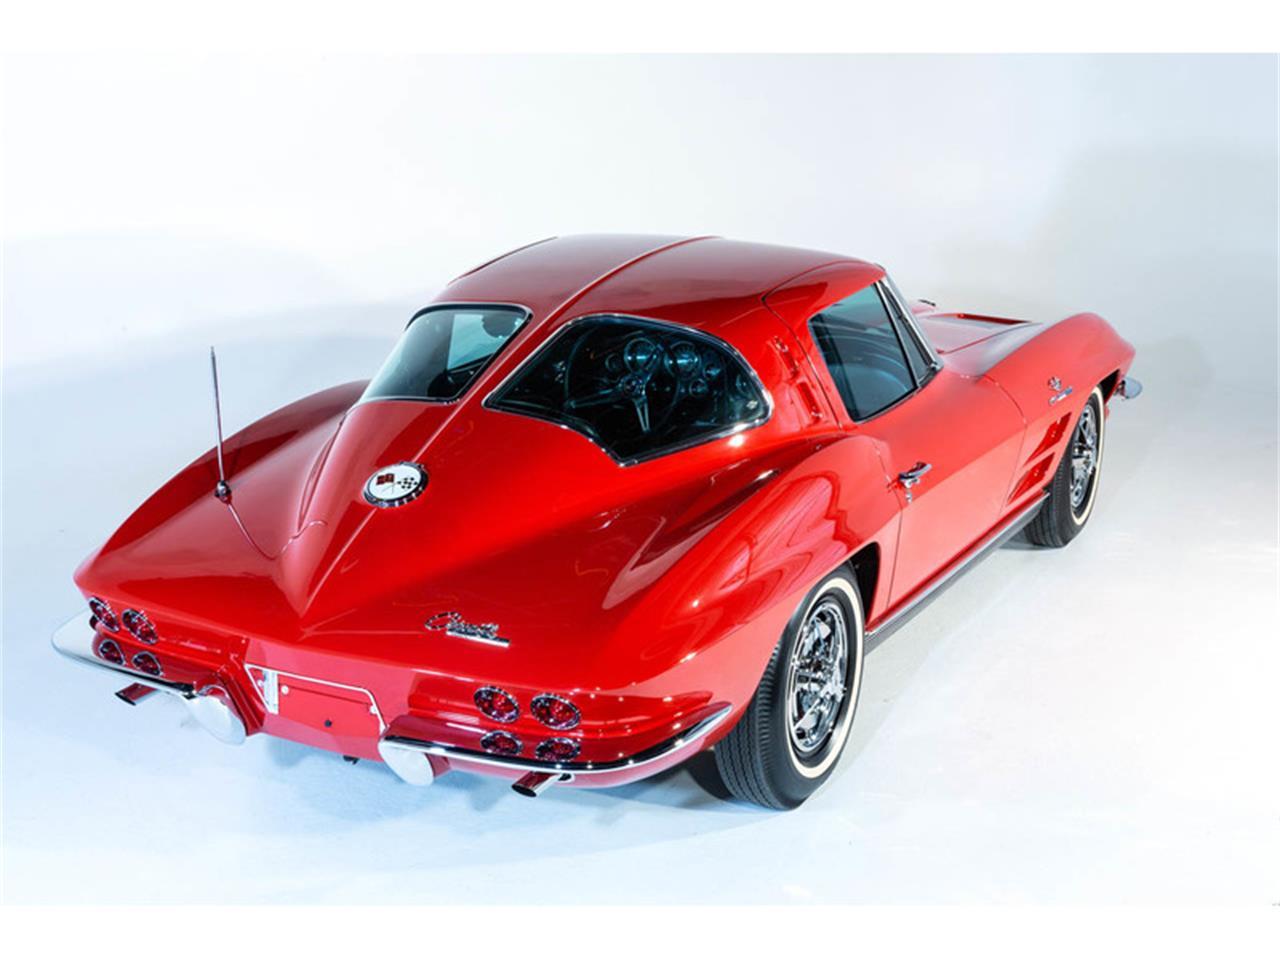 1963 chevrolet corvette for sale classiccars.com cc-1323265